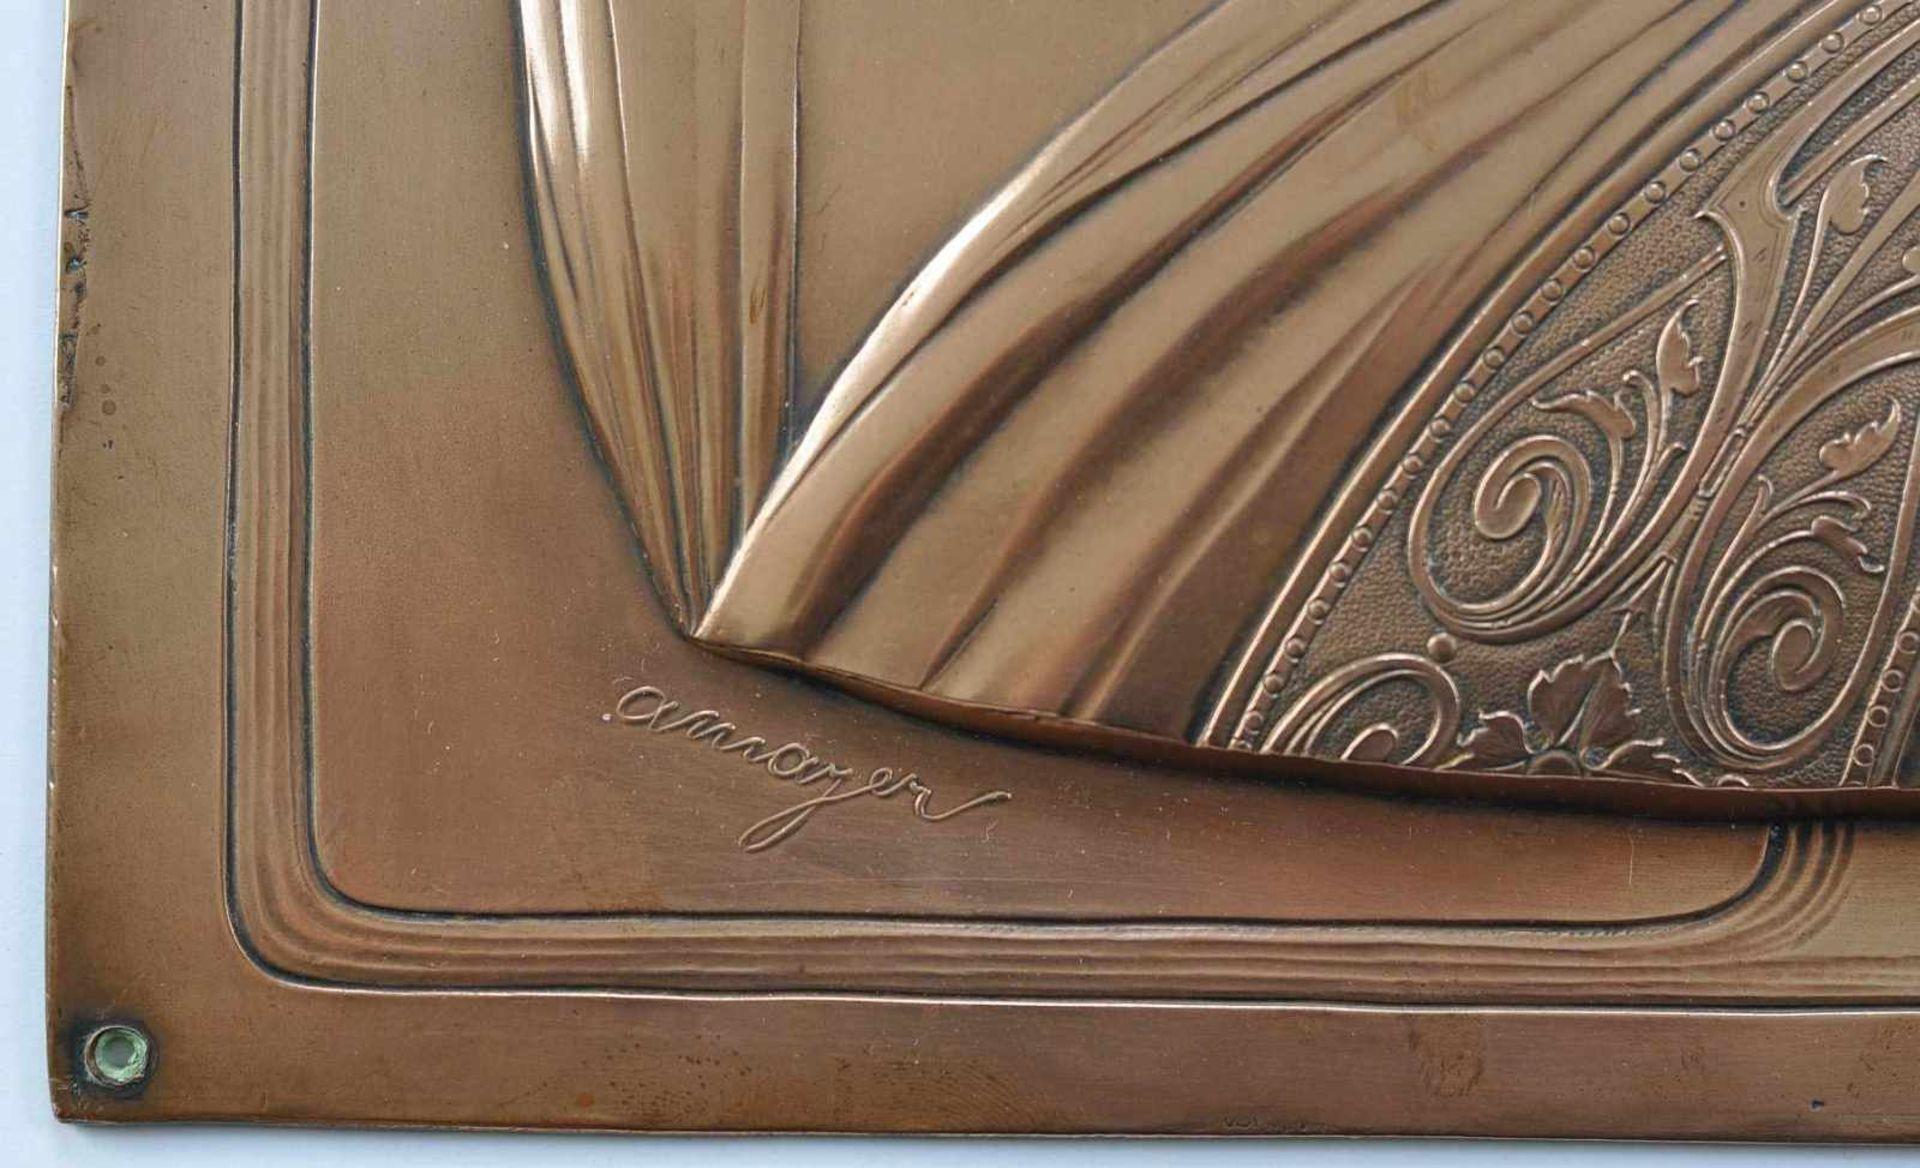 MAYER, Albert (*1867 Esslingen +1944 Geislingen), Reliefplakette, Kupfer, geprägt, getrieben, - Bild 2 aus 2